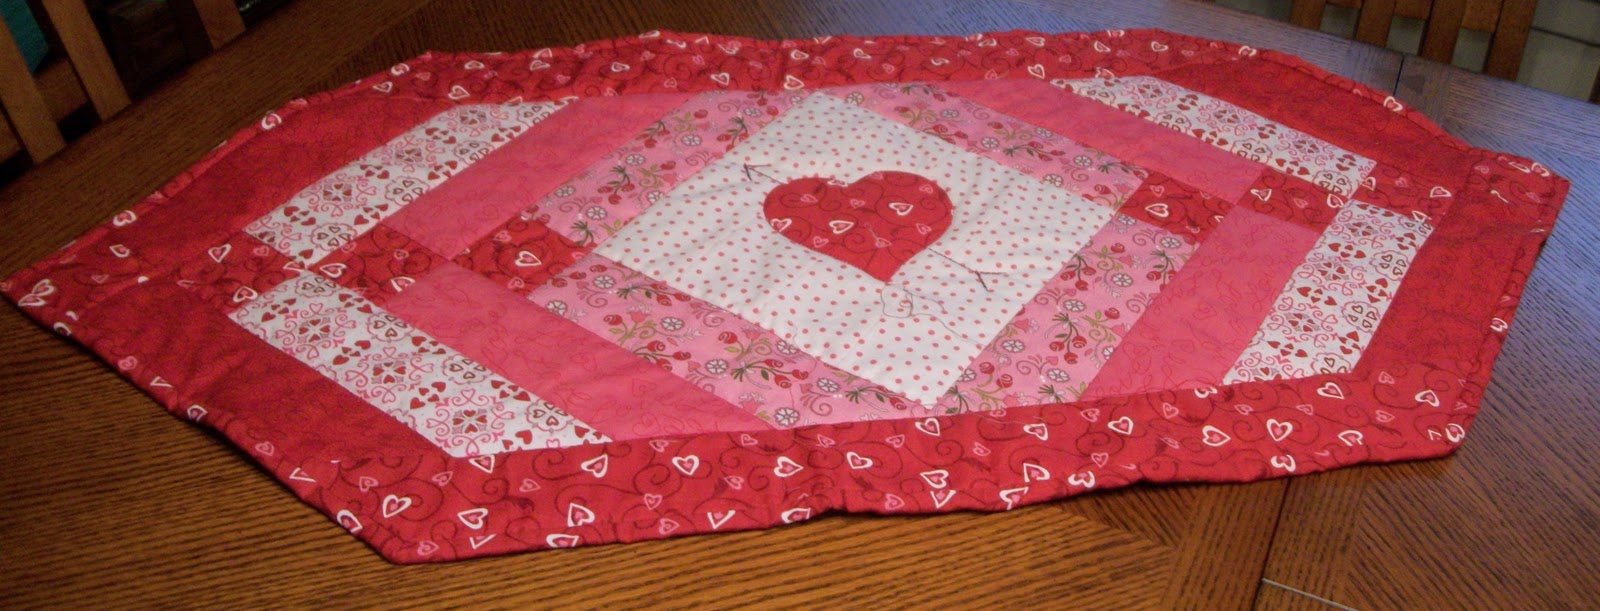 Craizee Corners: Valentines Day Showcase